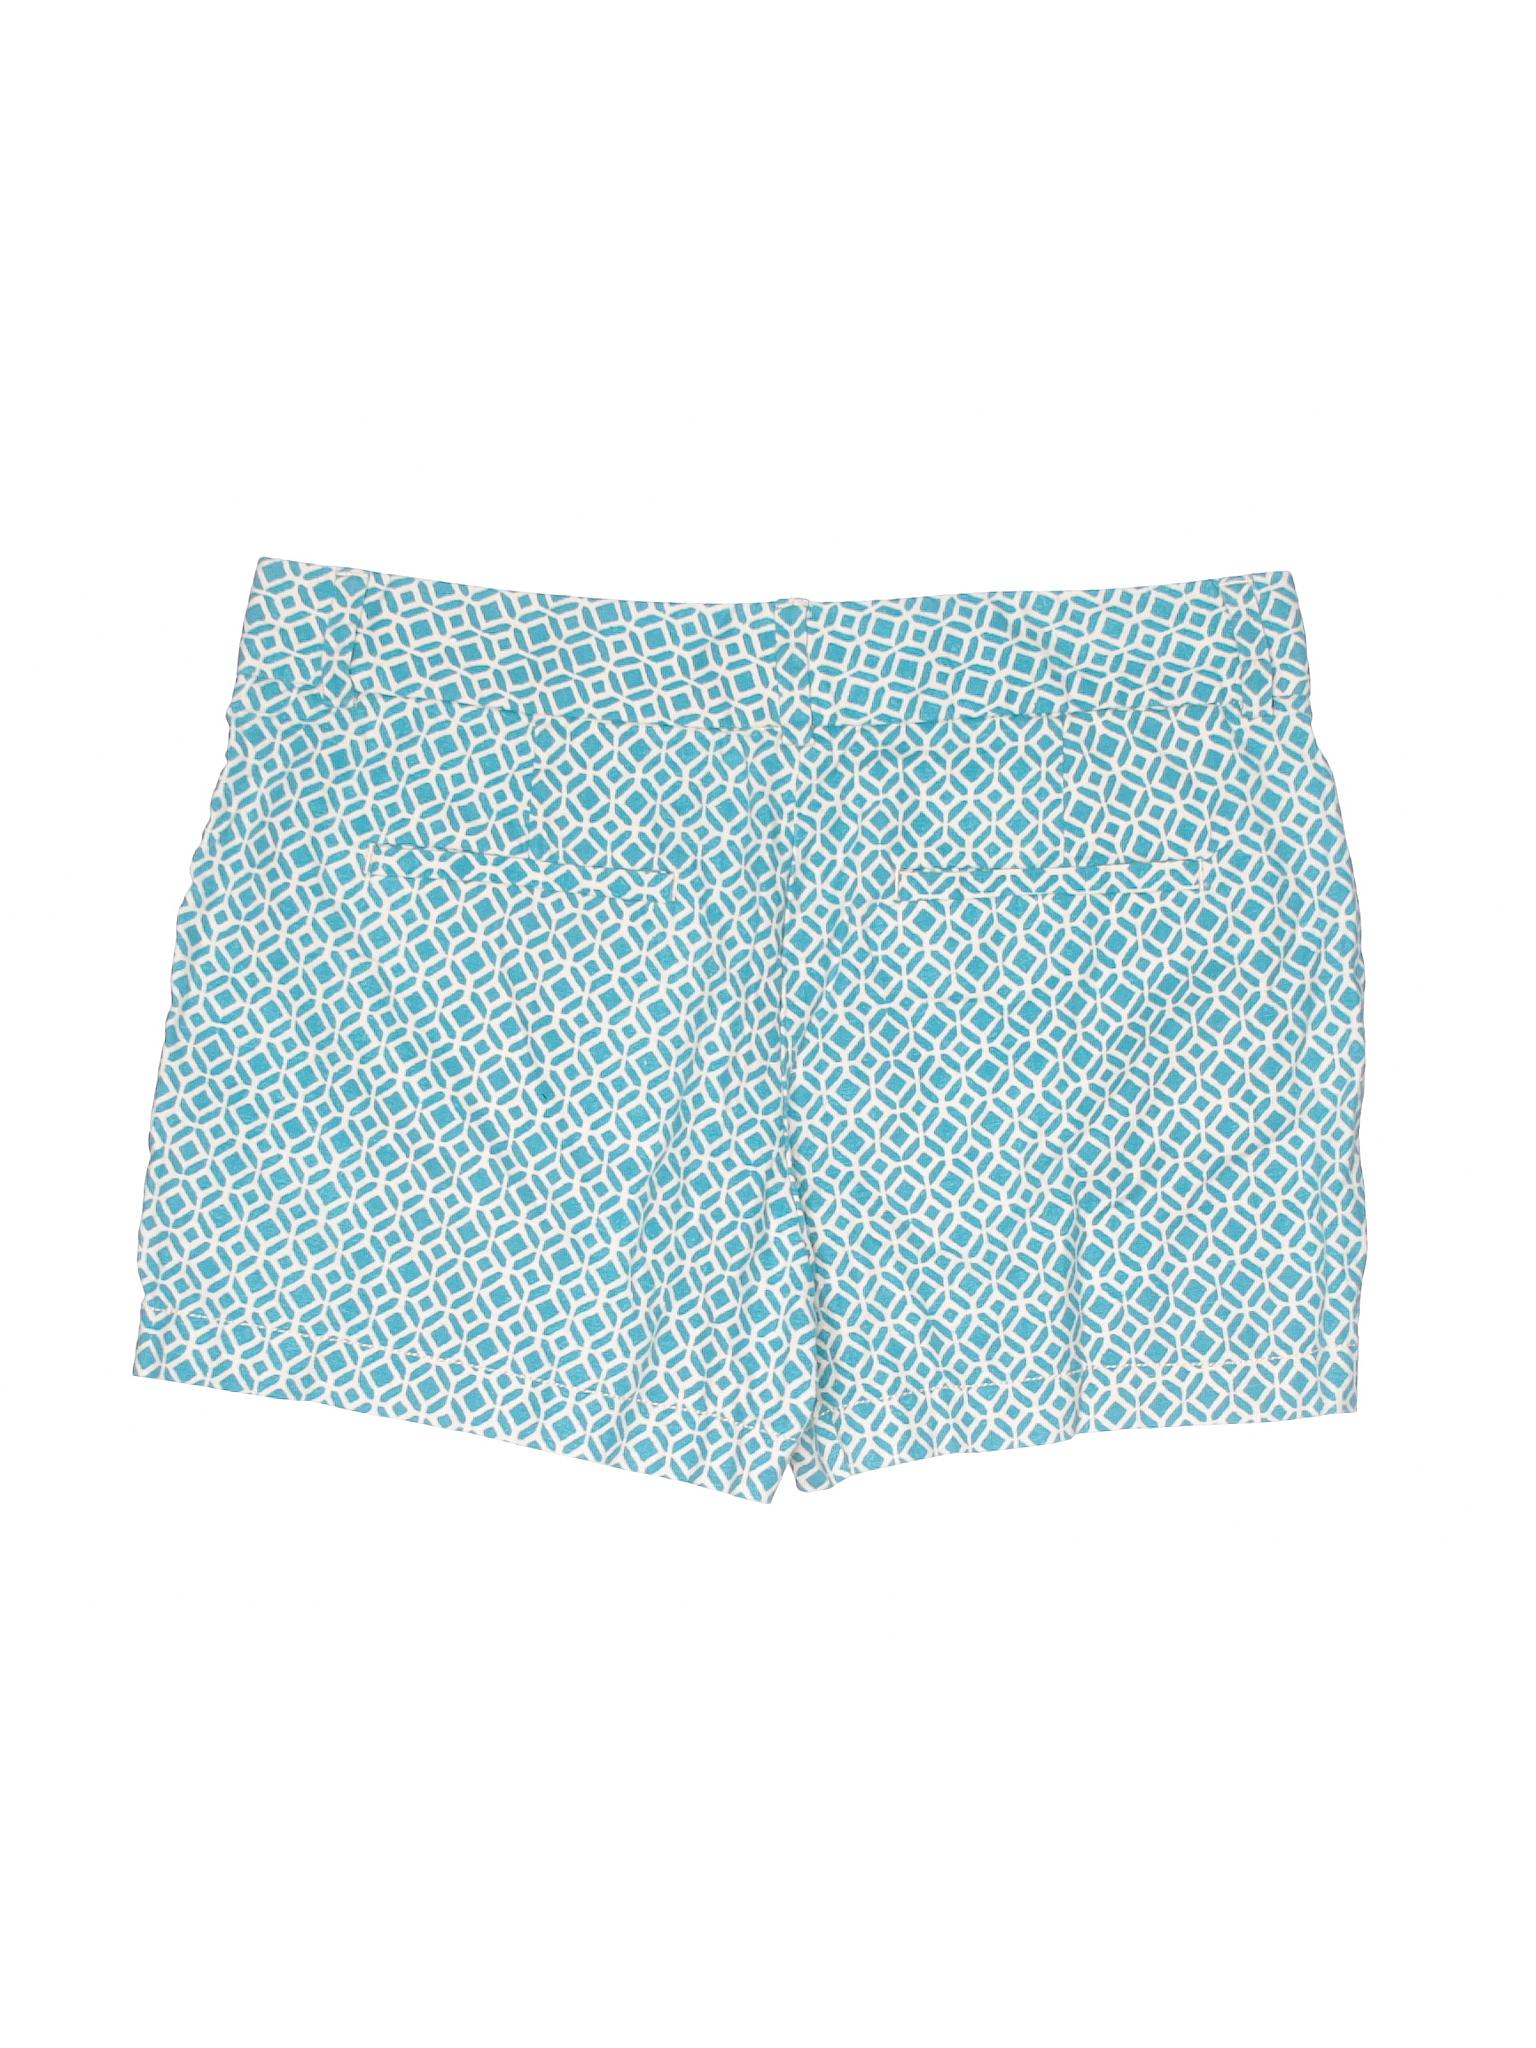 LOFT Taylor Boutique Boutique Shorts Ann Ann n0qBSZ